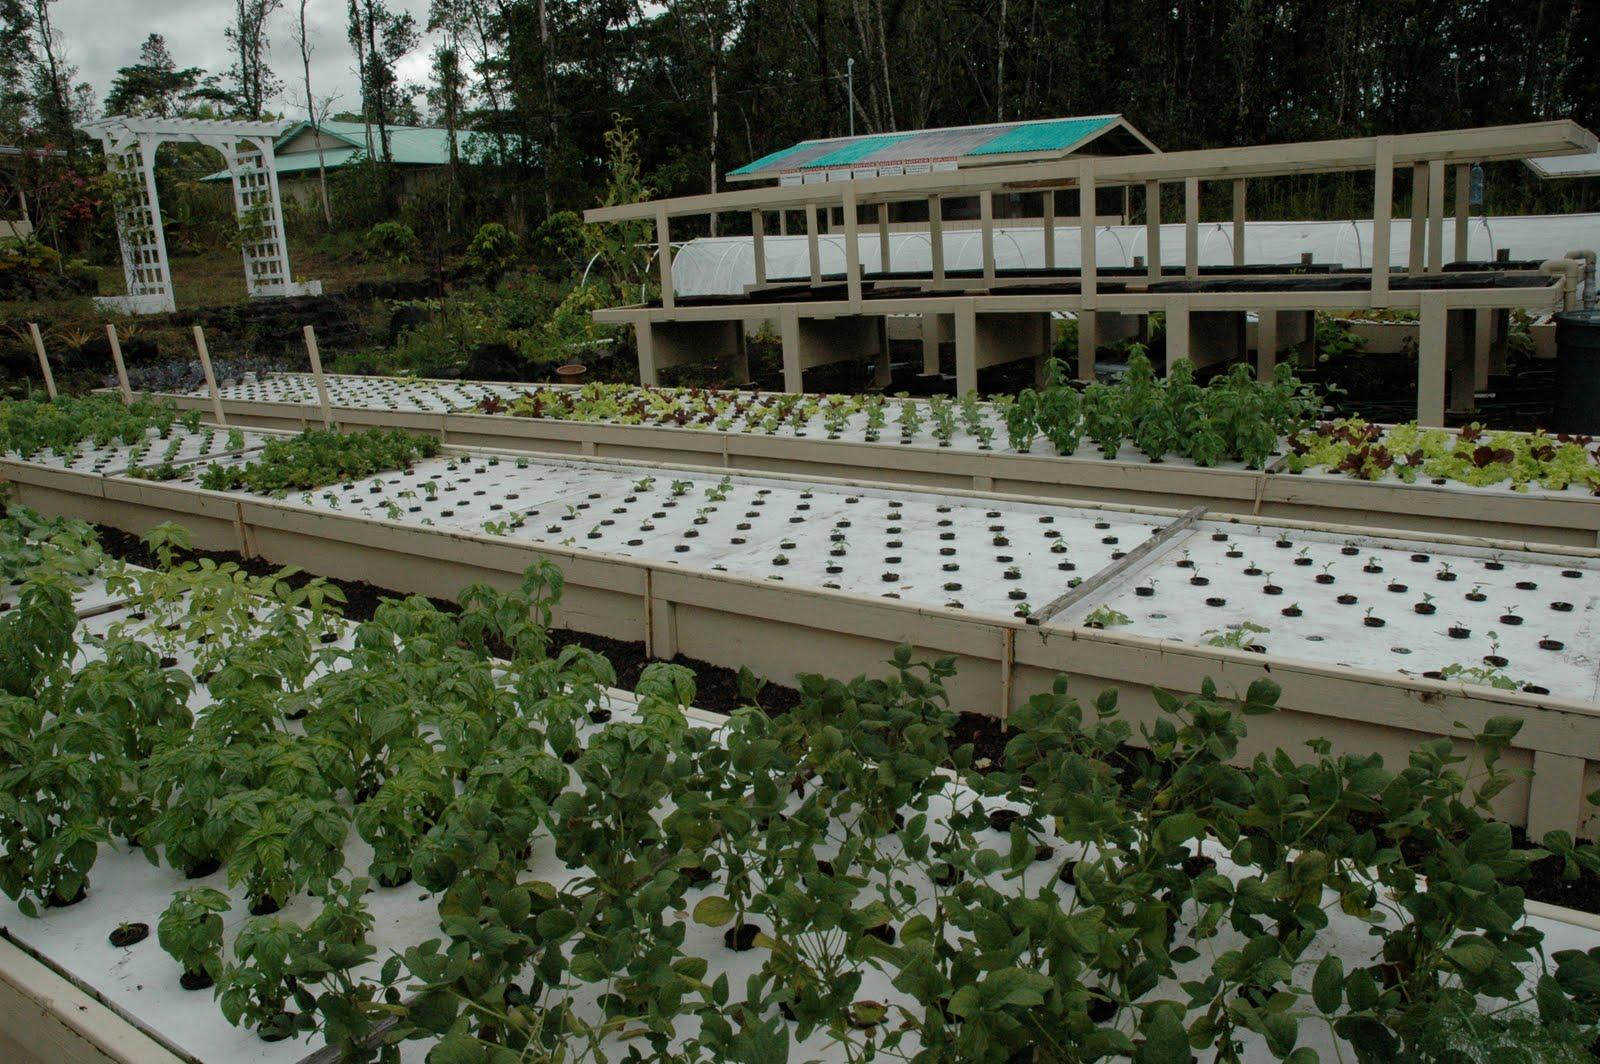 Hawaii real estate aquaponic farm for sale for Aquaponics hawaii